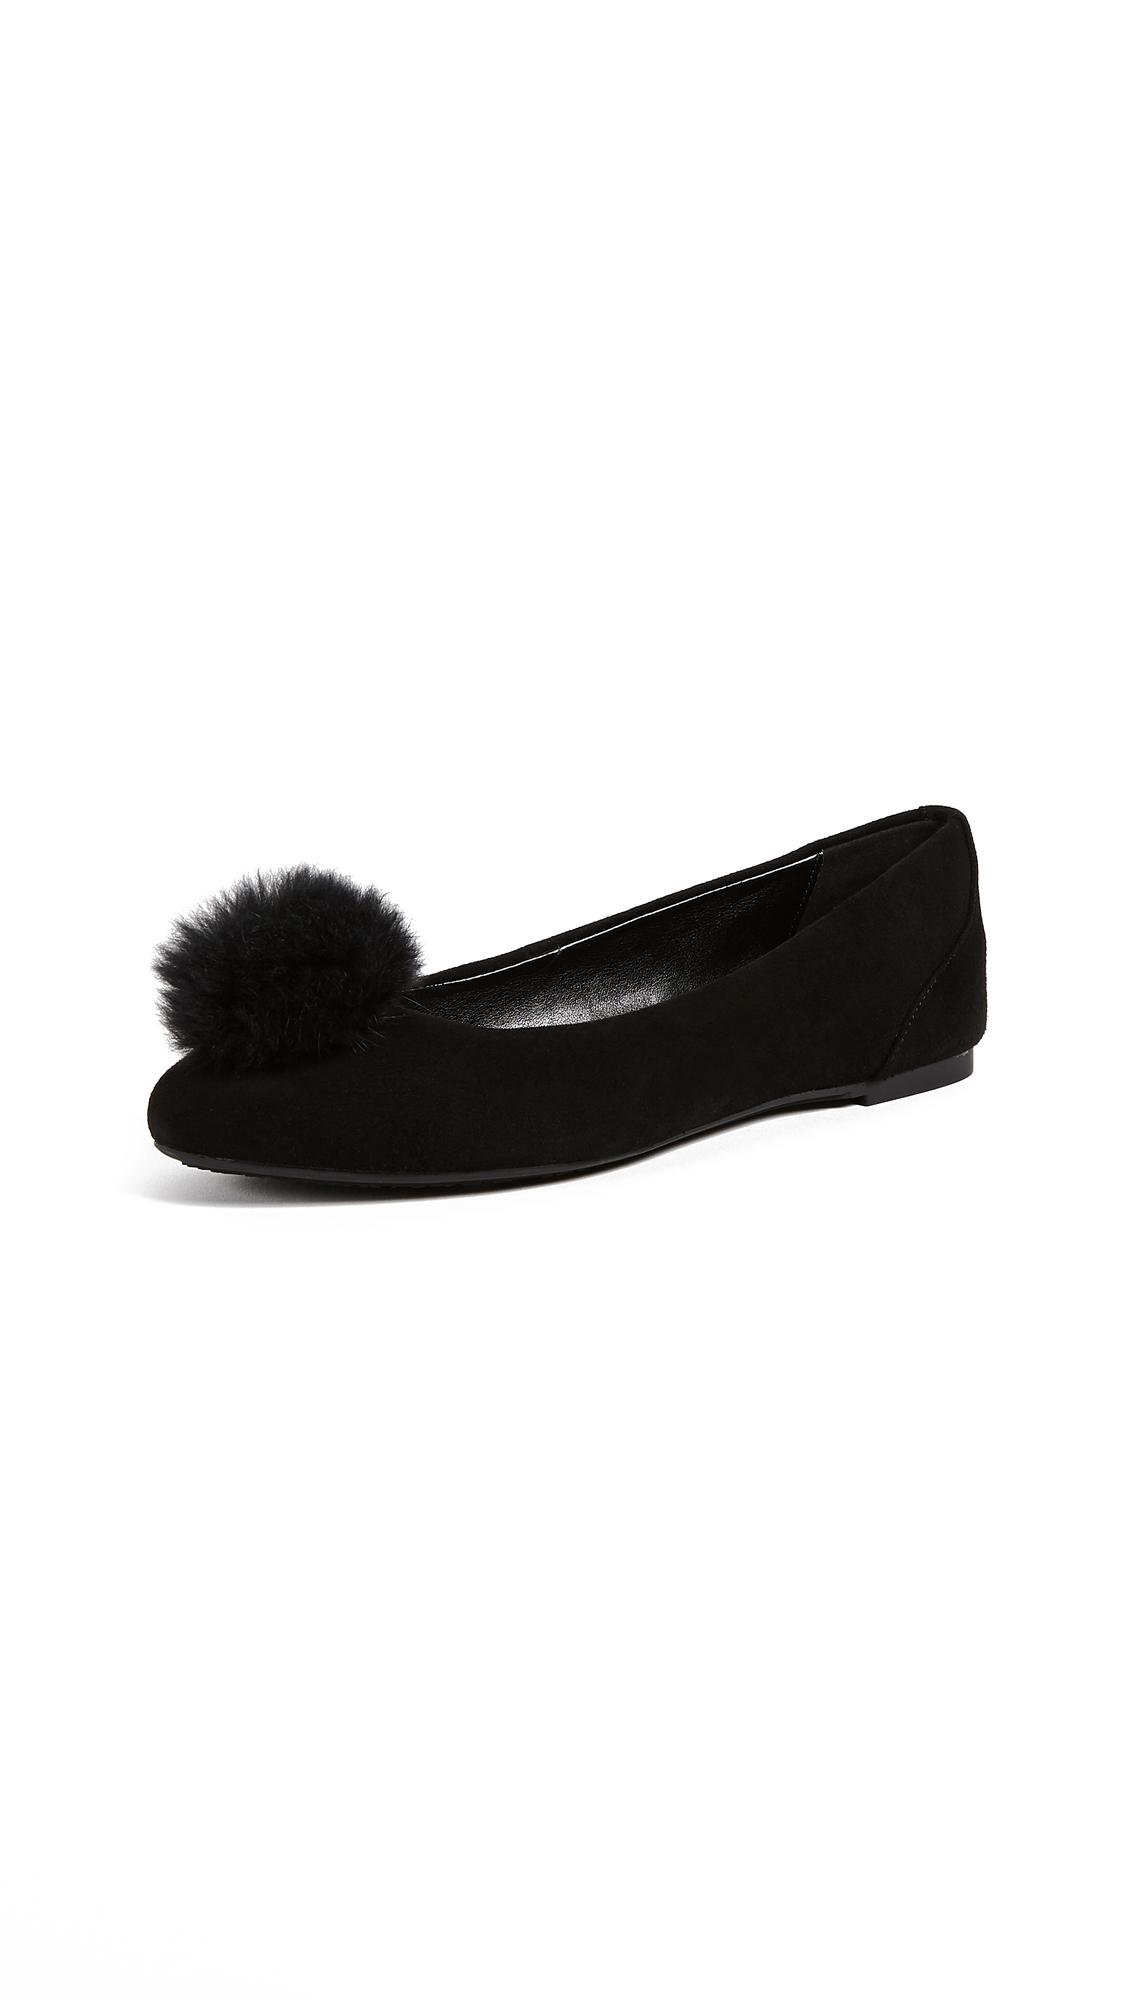 MICHAEL Michael Kors Remi Fur Pom Pom Ballet Flats - Black